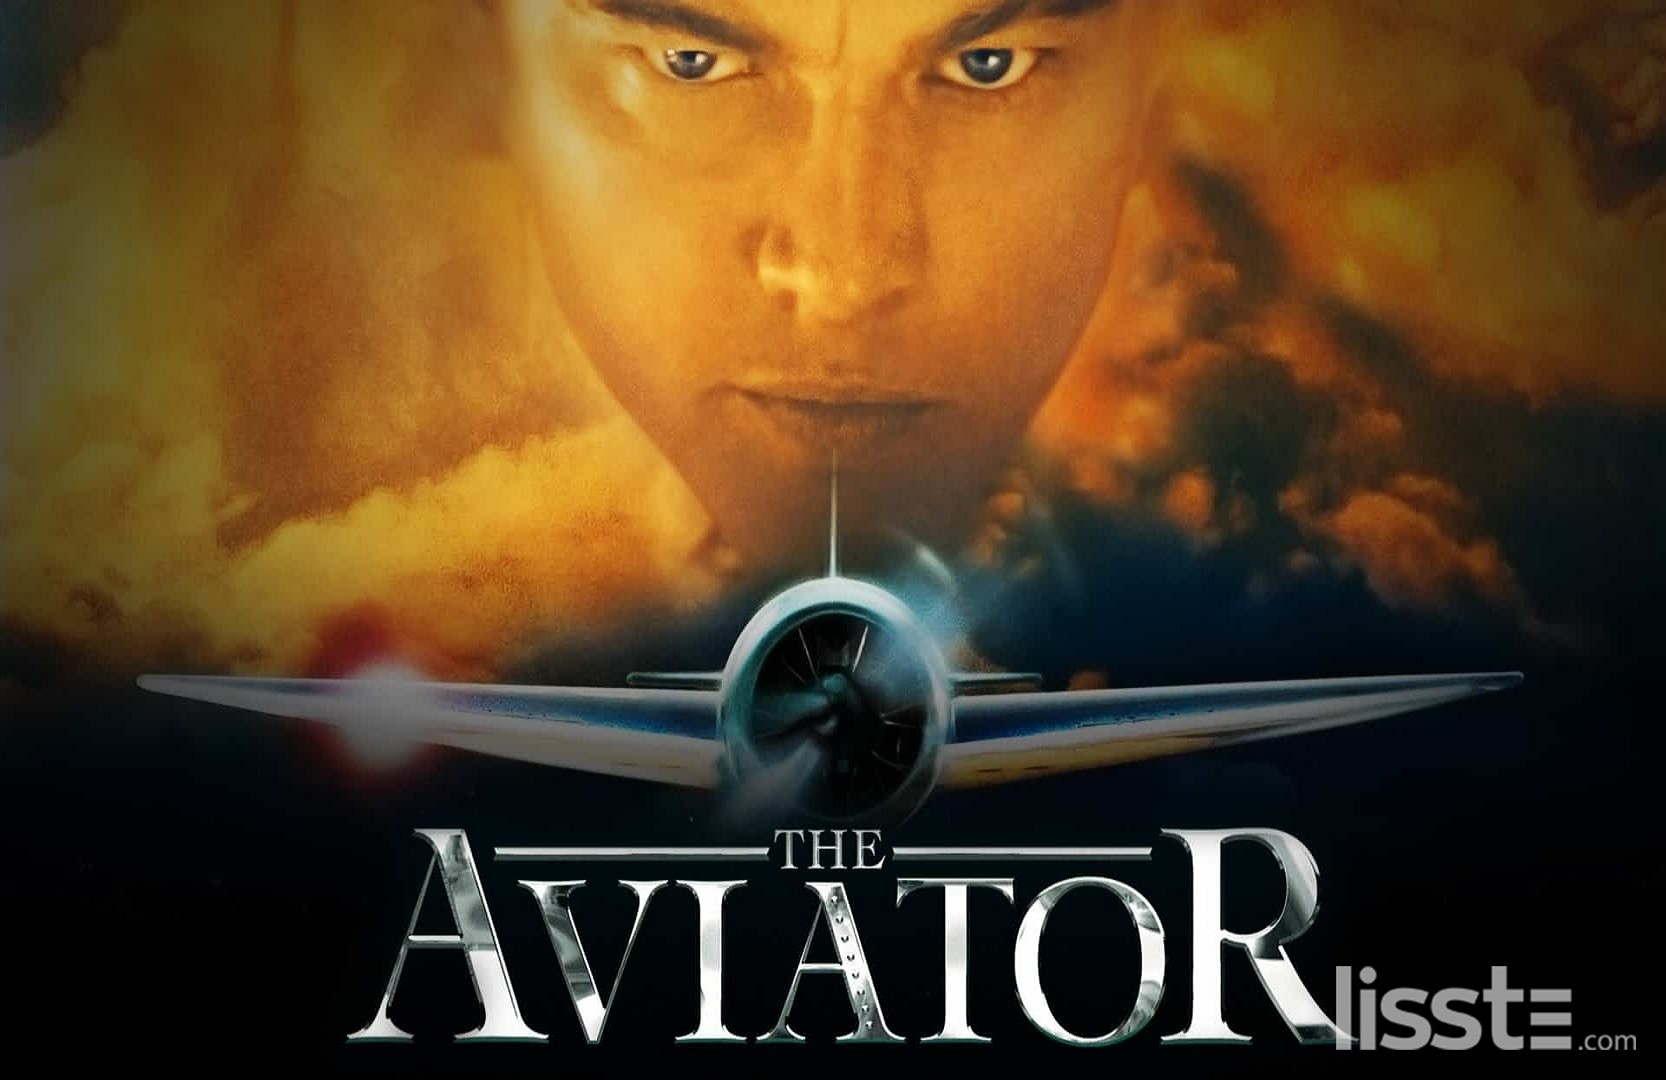 aviator-1566897882.jpg